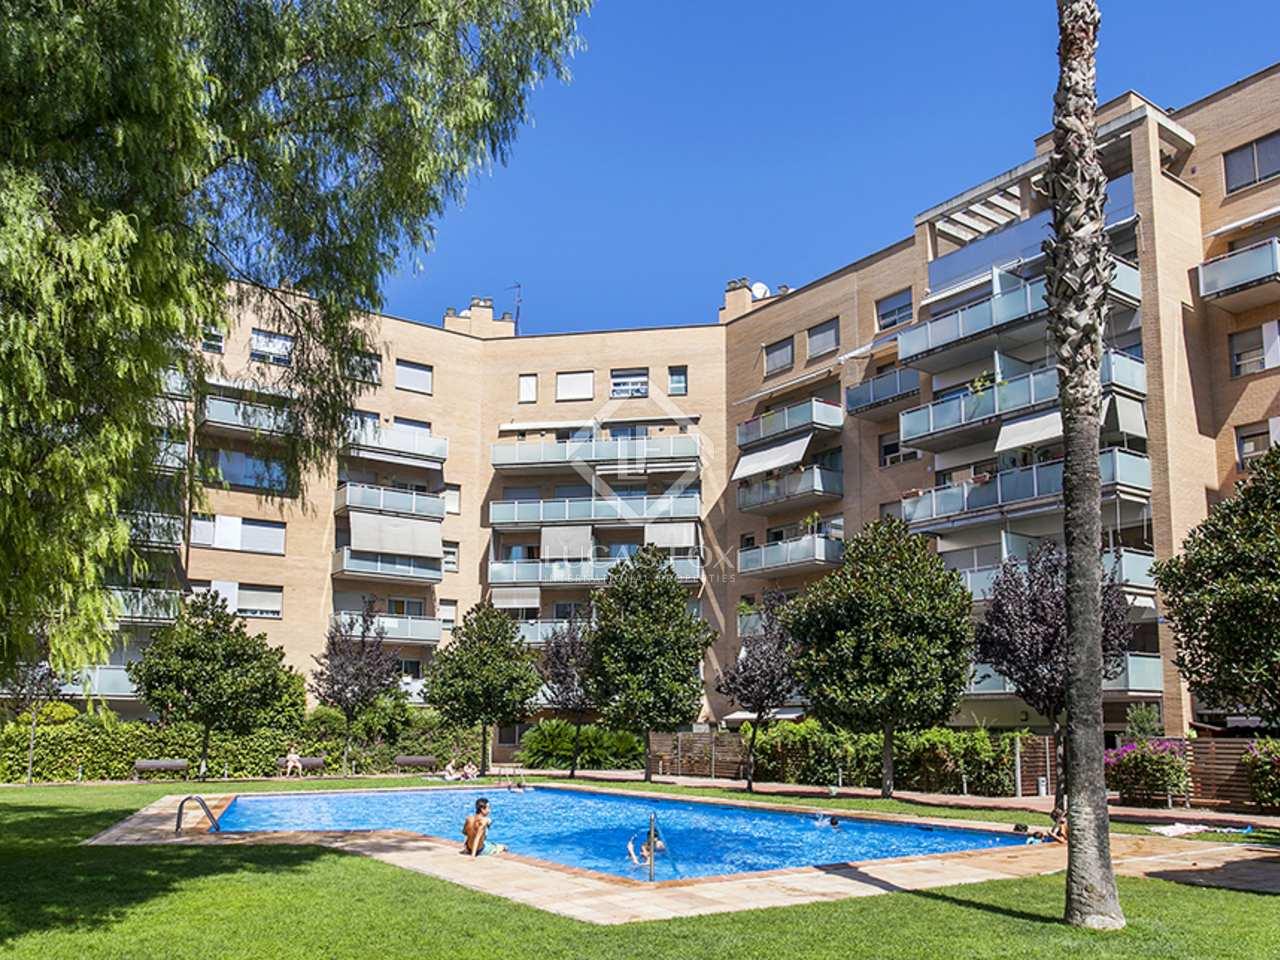 D plex de 3 dormitorios en venta en vila ol mpica barcelona for Piscina olimpica barcelona